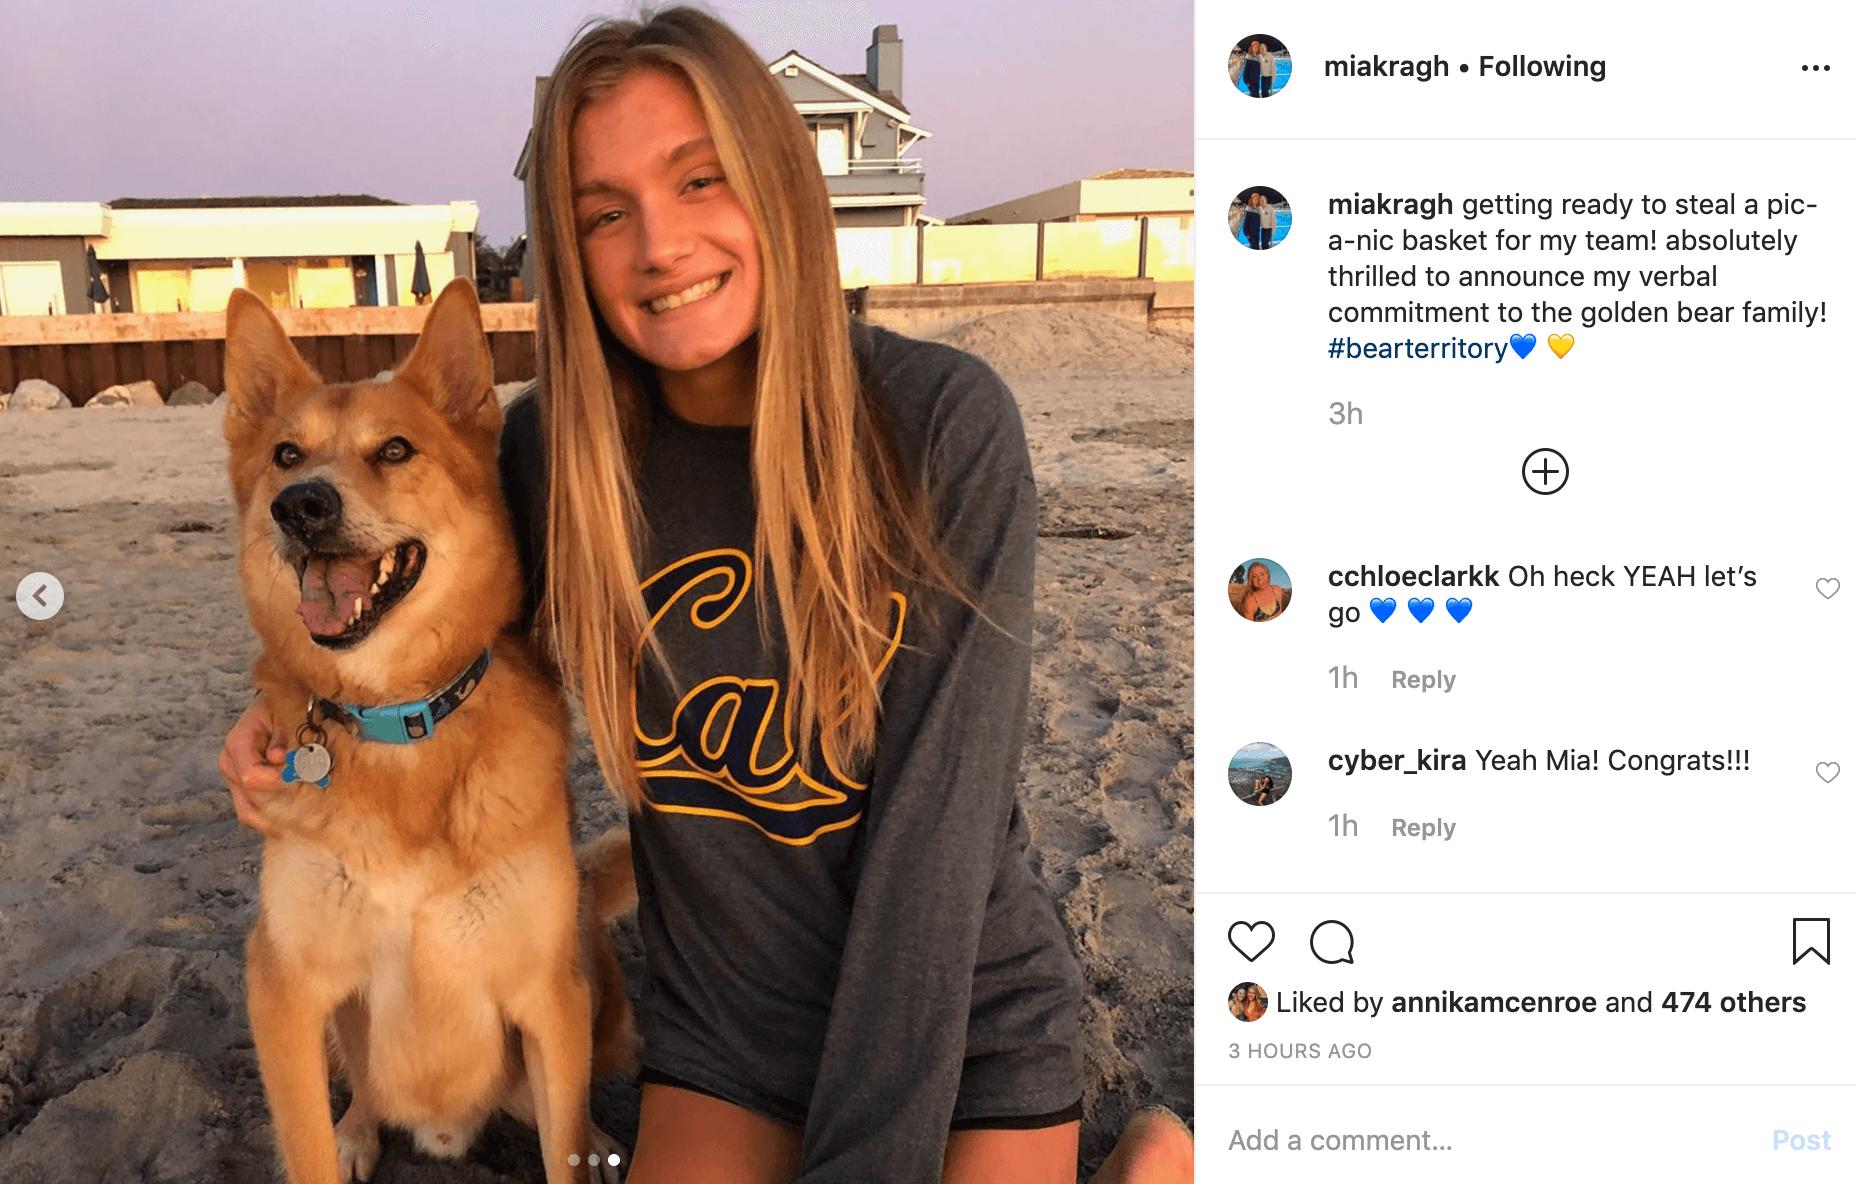 Mia Kragh Instagram  cal commitment